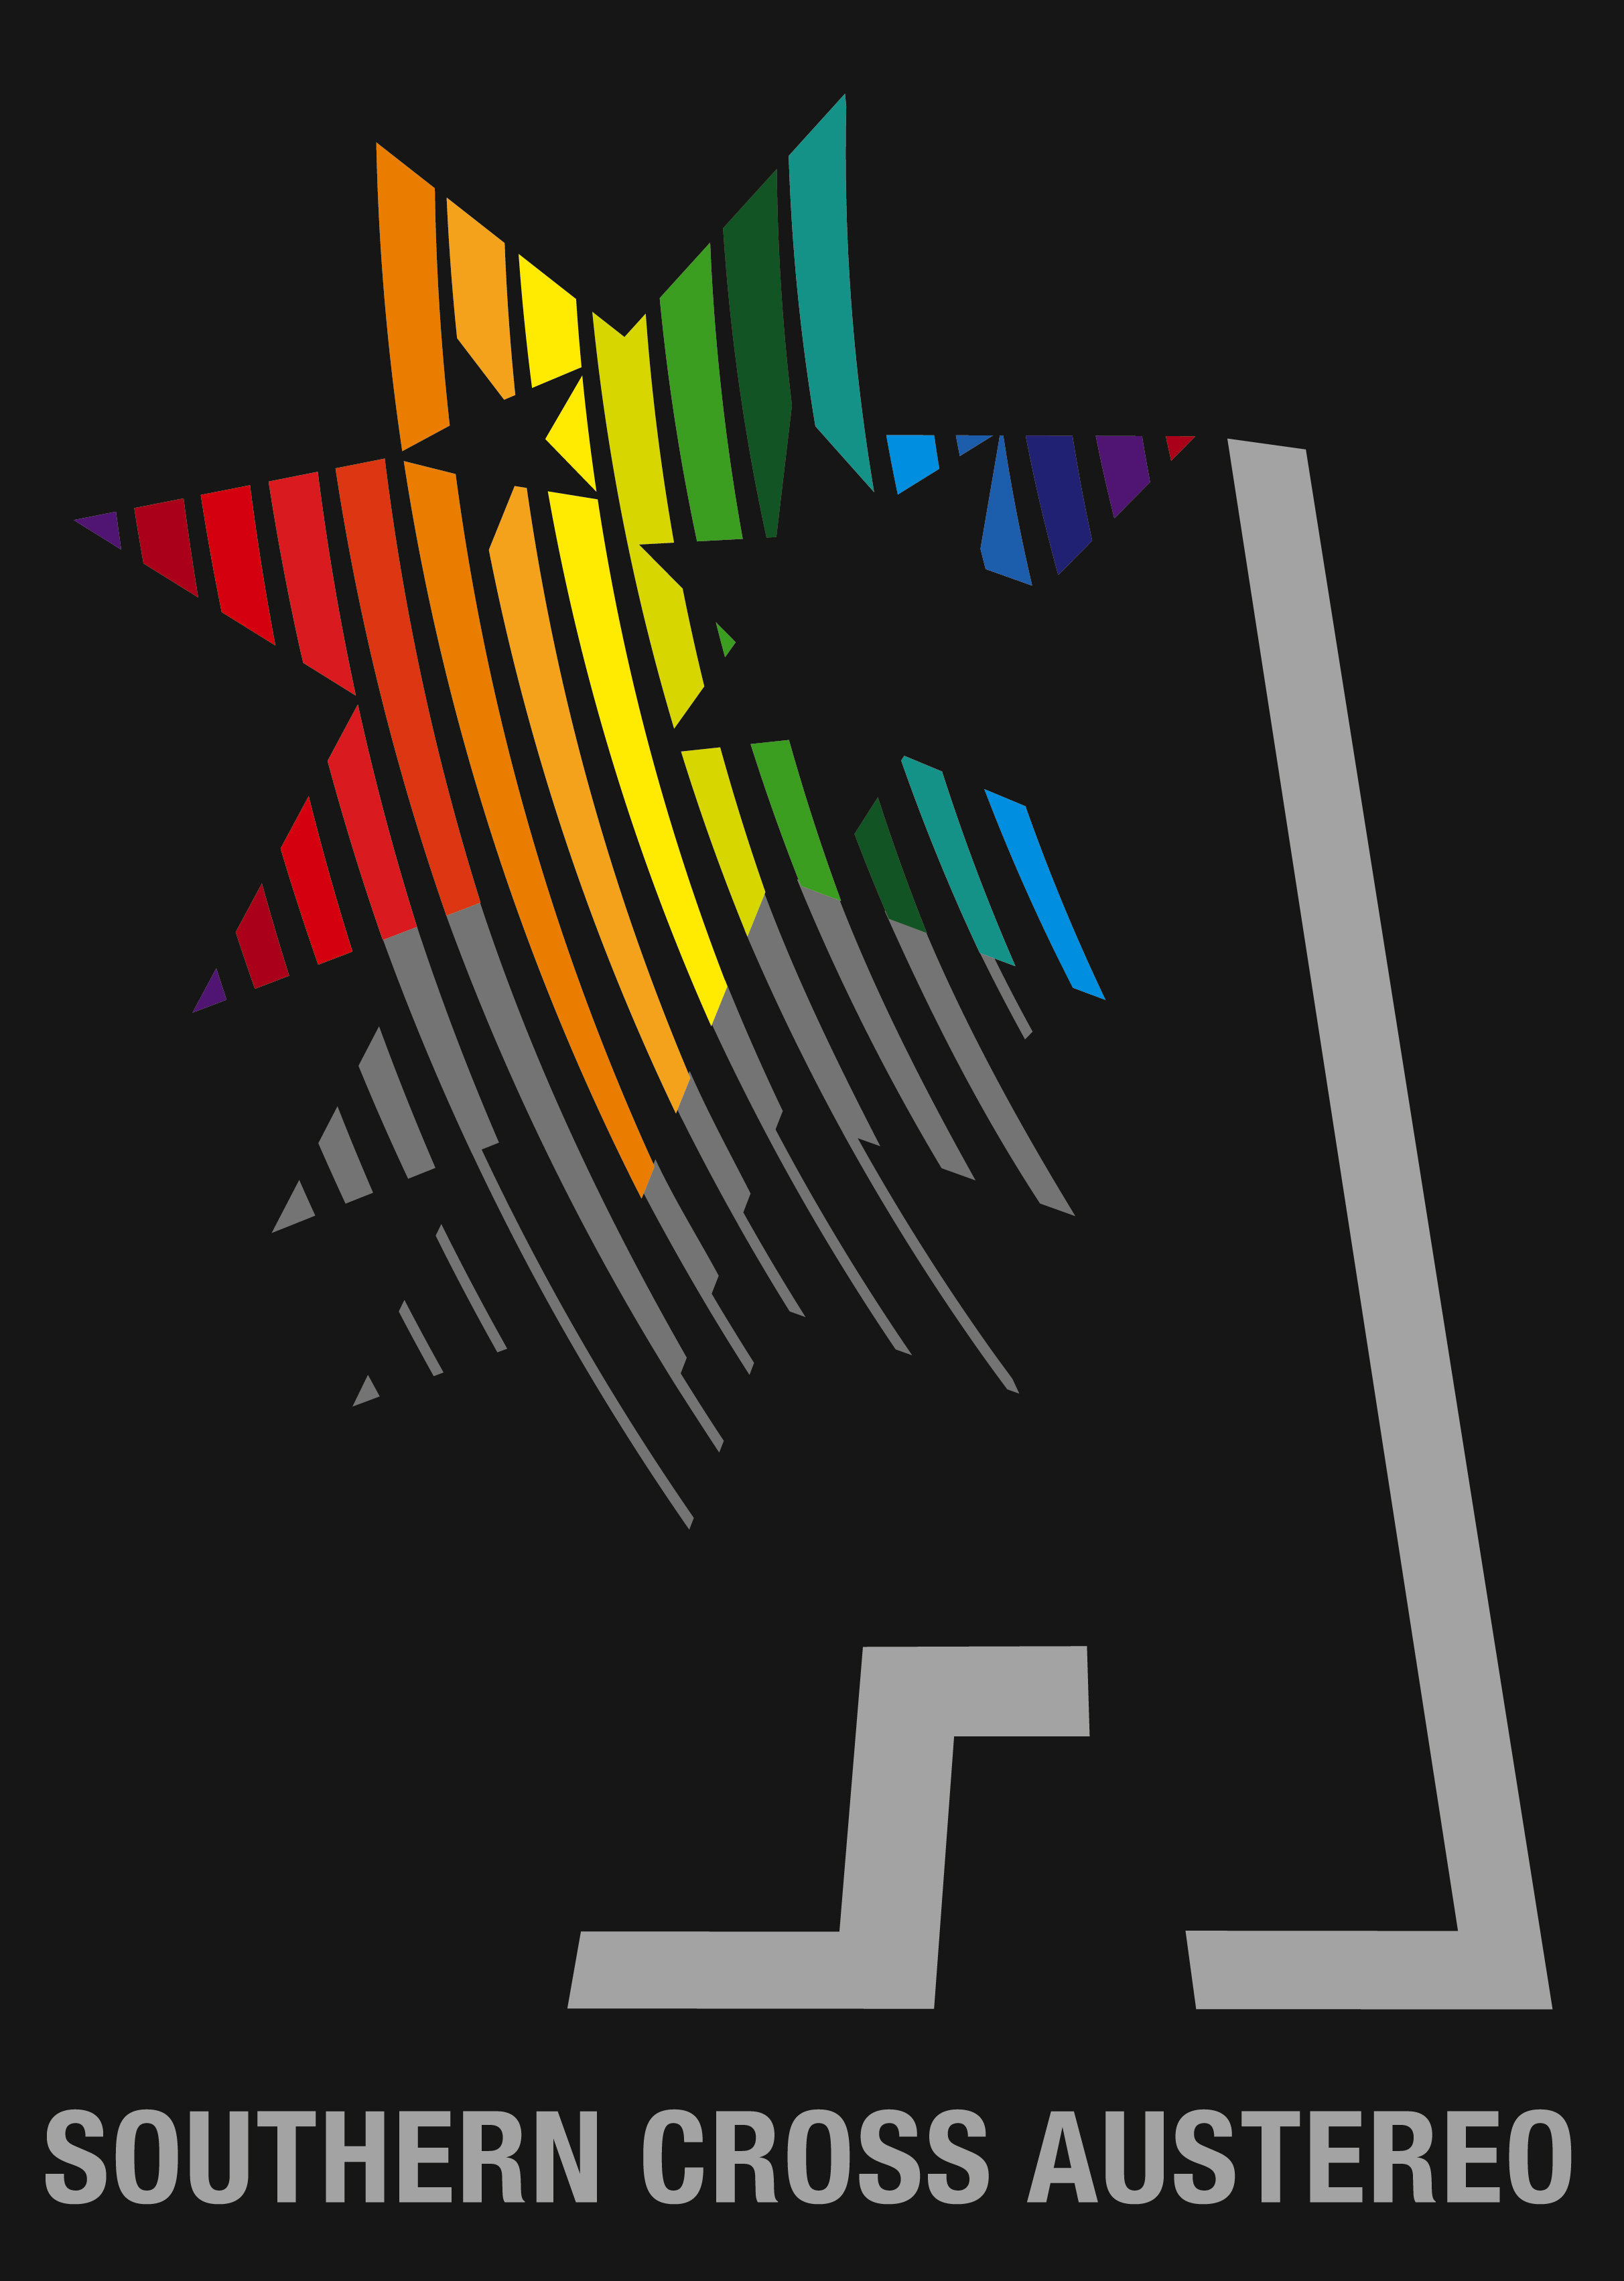 southern-cross-austereo-logo.jpg